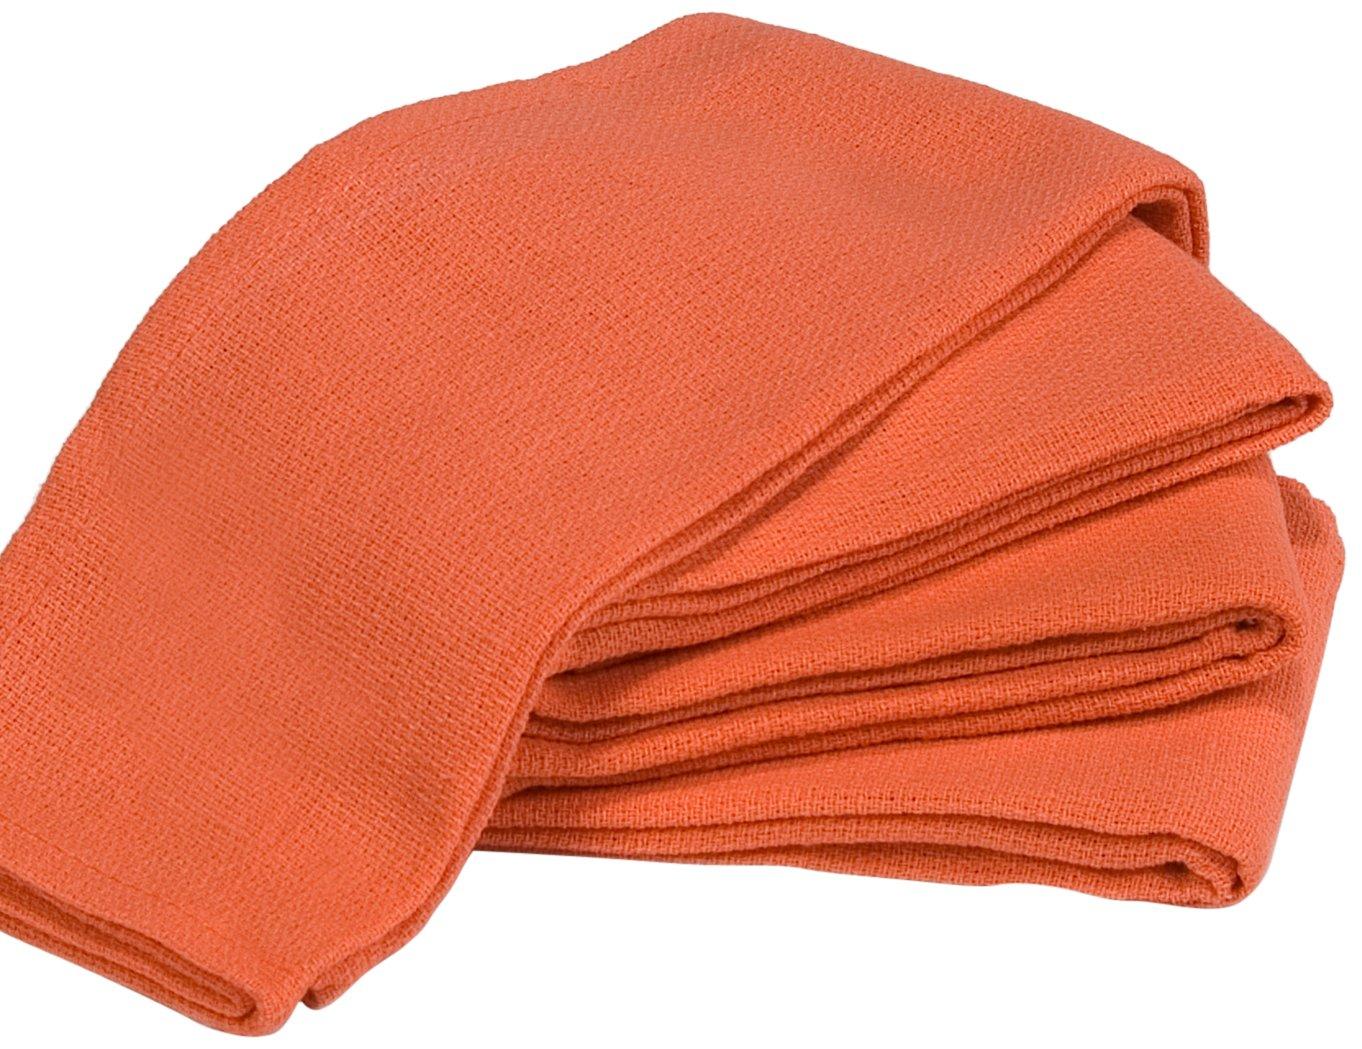 Towels by Doctor Joe 9-SUR-O16-6EA